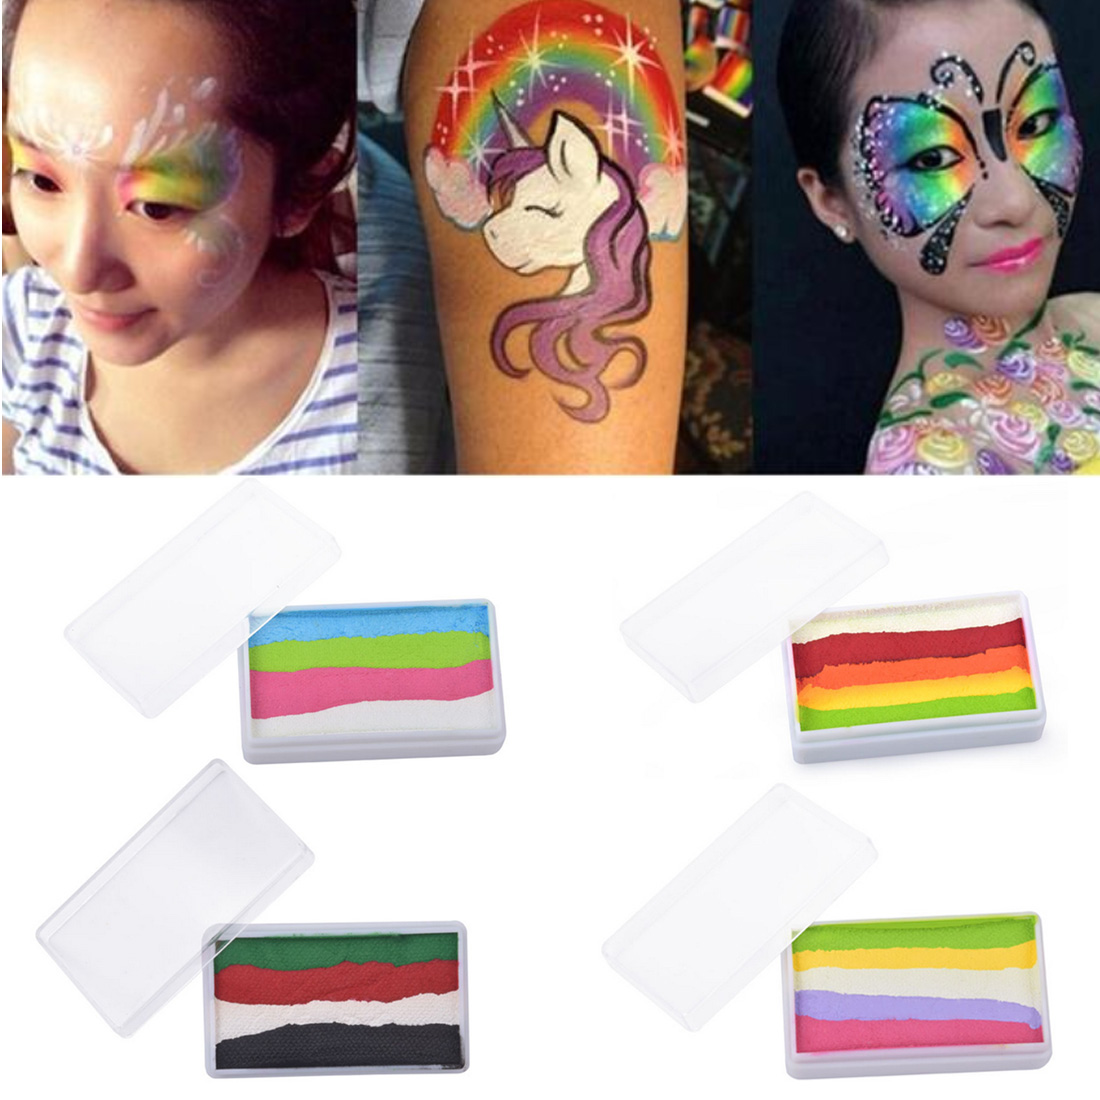 Rainbow Body Paint Halloween Face Painting Makeup Pigment 30g/piece Multicolor Series Temporary Body Art Tattoo Split Cakes